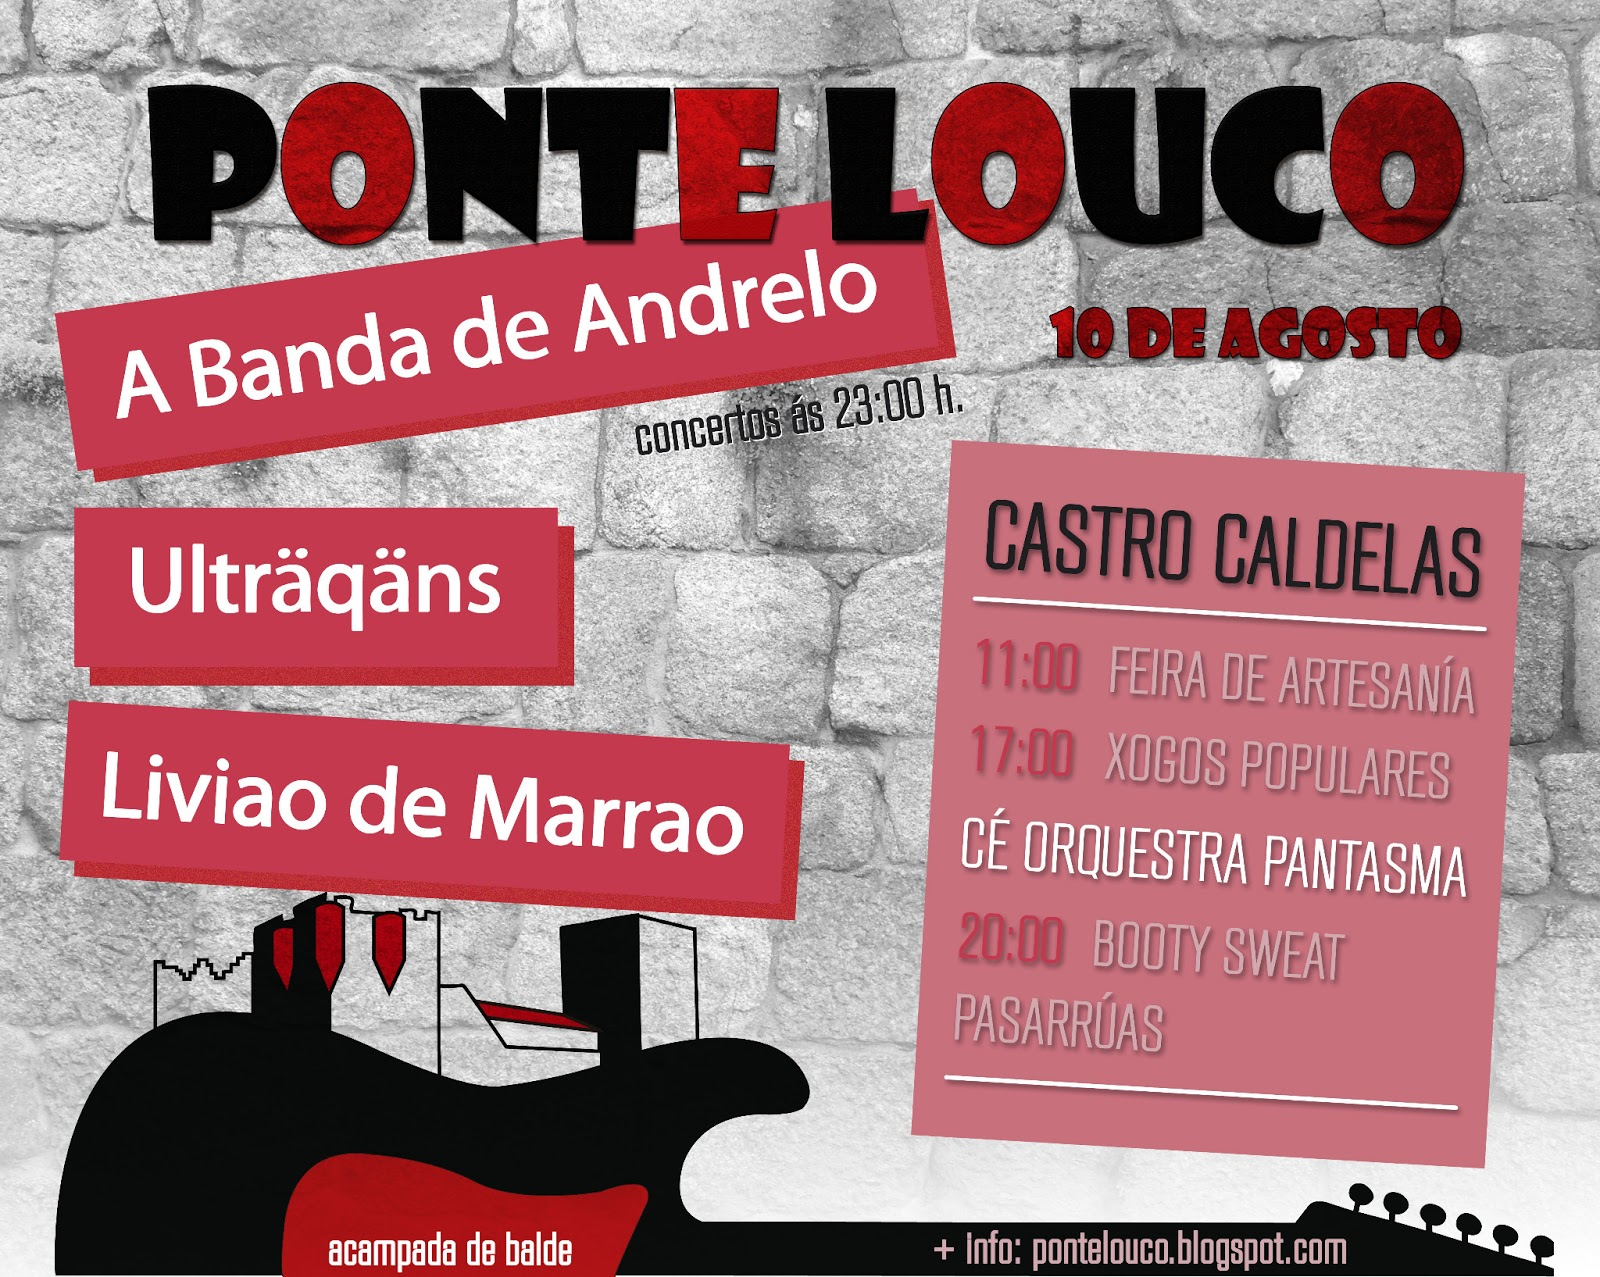 13 Pontelouco